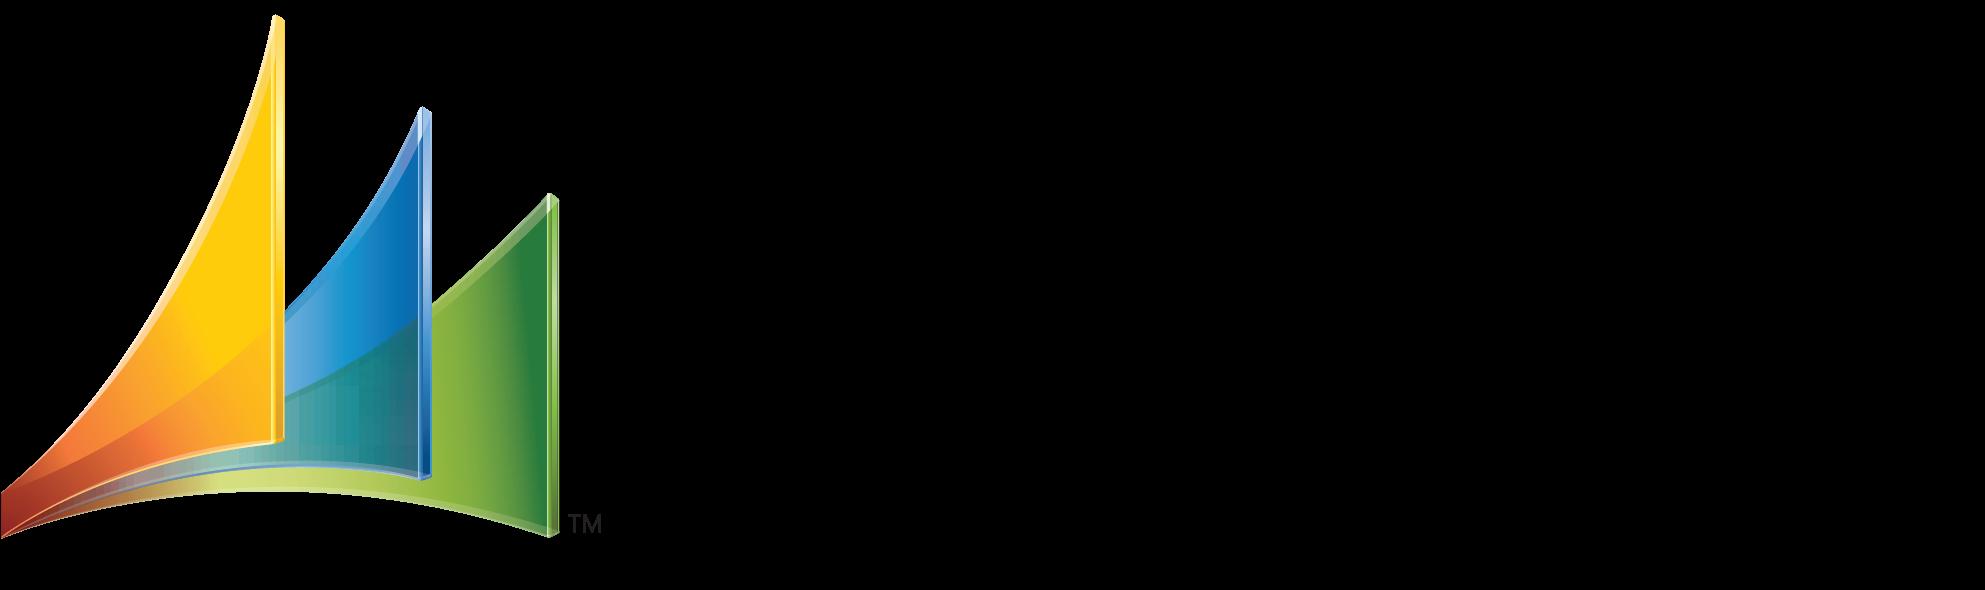 HD Microsoft Partner Toronto Atum Corporation.